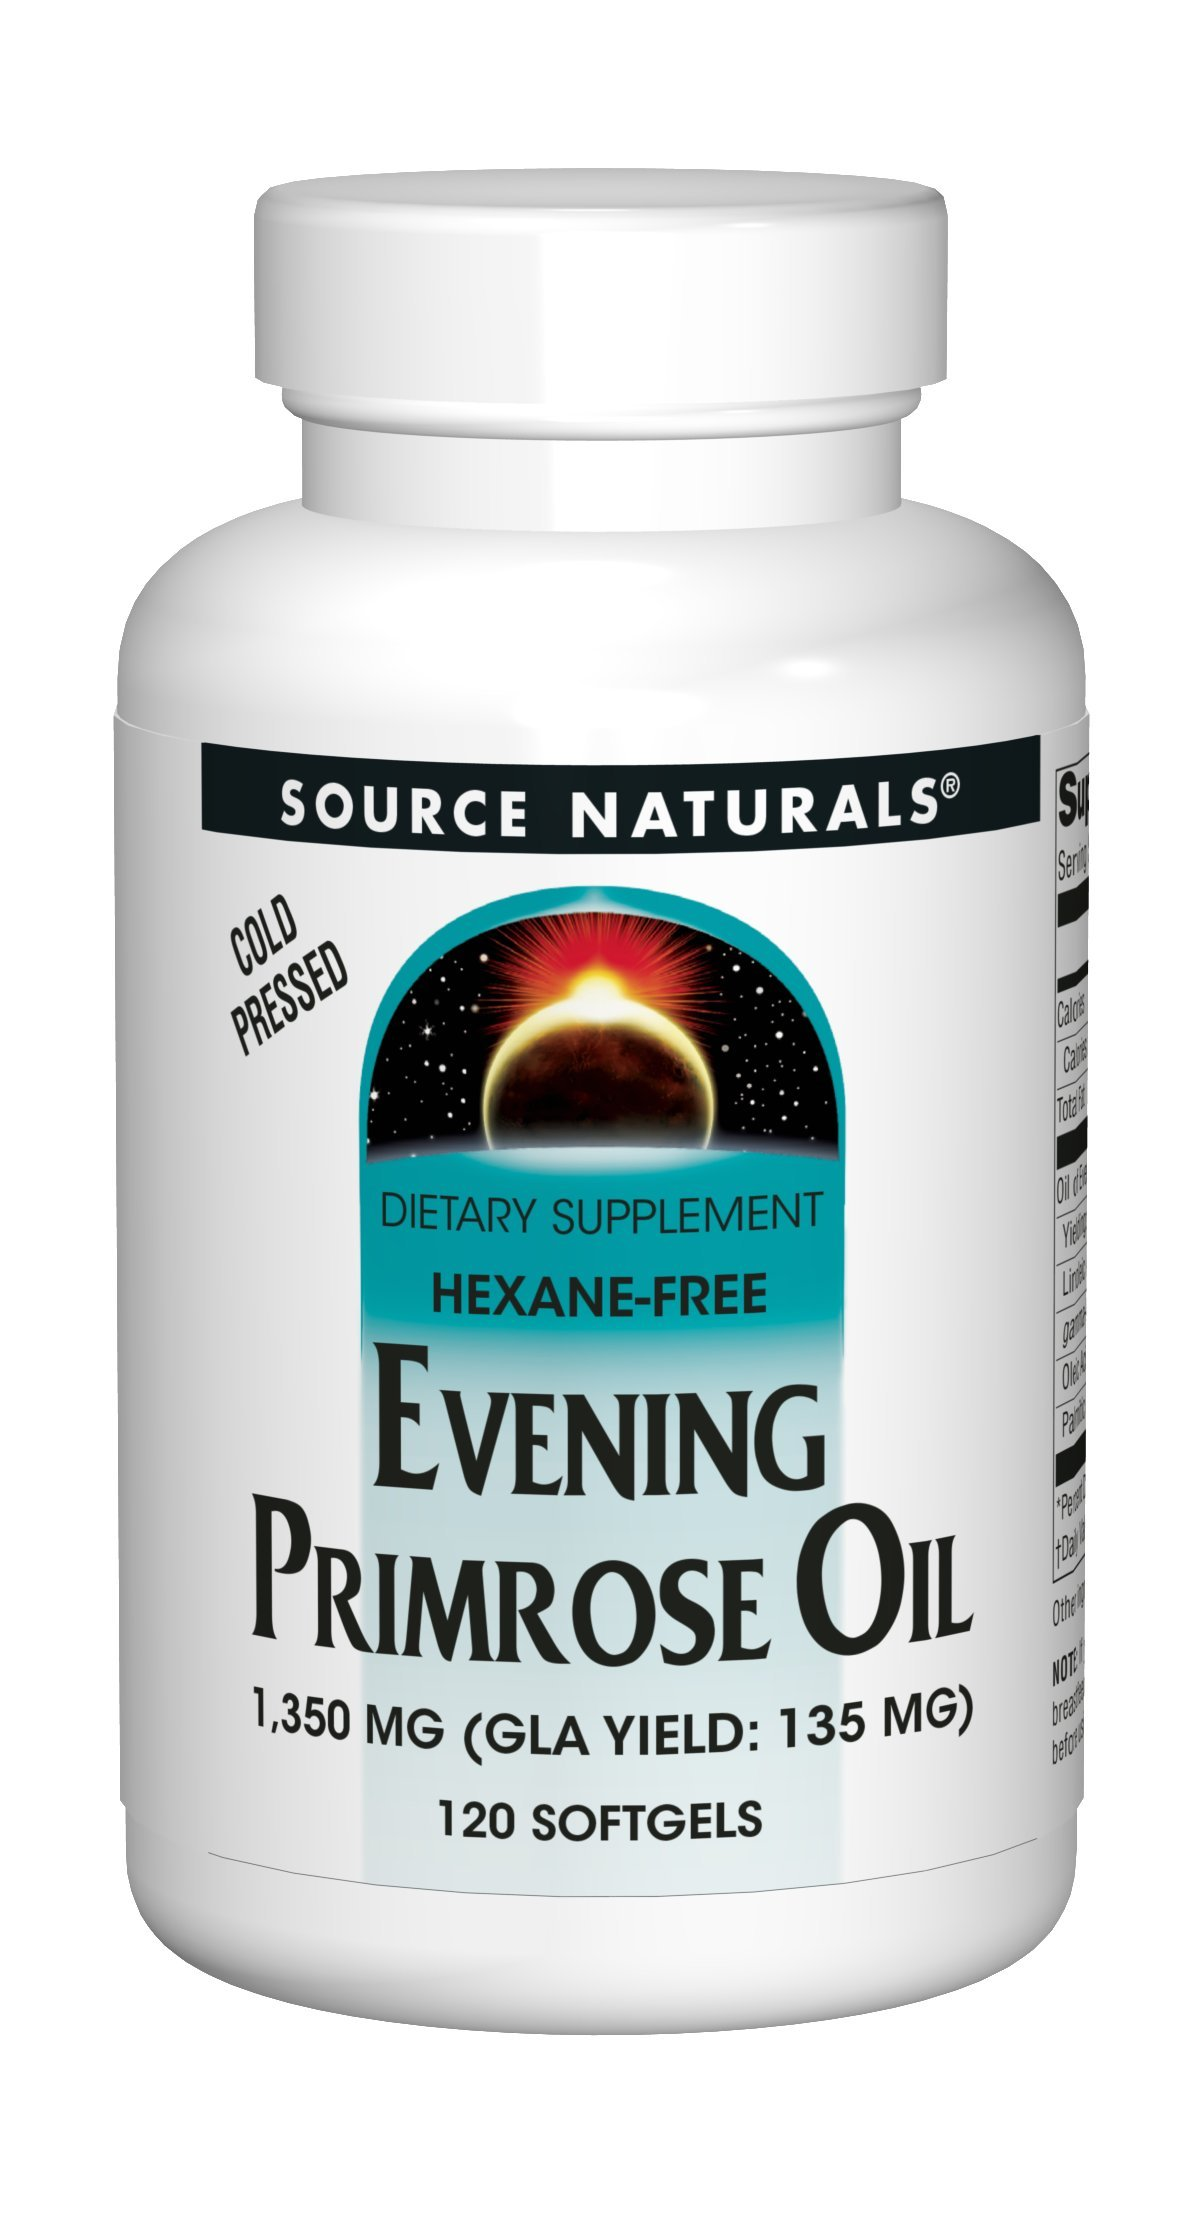 Source Naturals Evening Primrose Oil 1350mg (135mg GLA) Cold-Pressed, Hexane-Free Fatty-Acid Gamma-Linolenic & Linoleic Acid - 120 Softgels